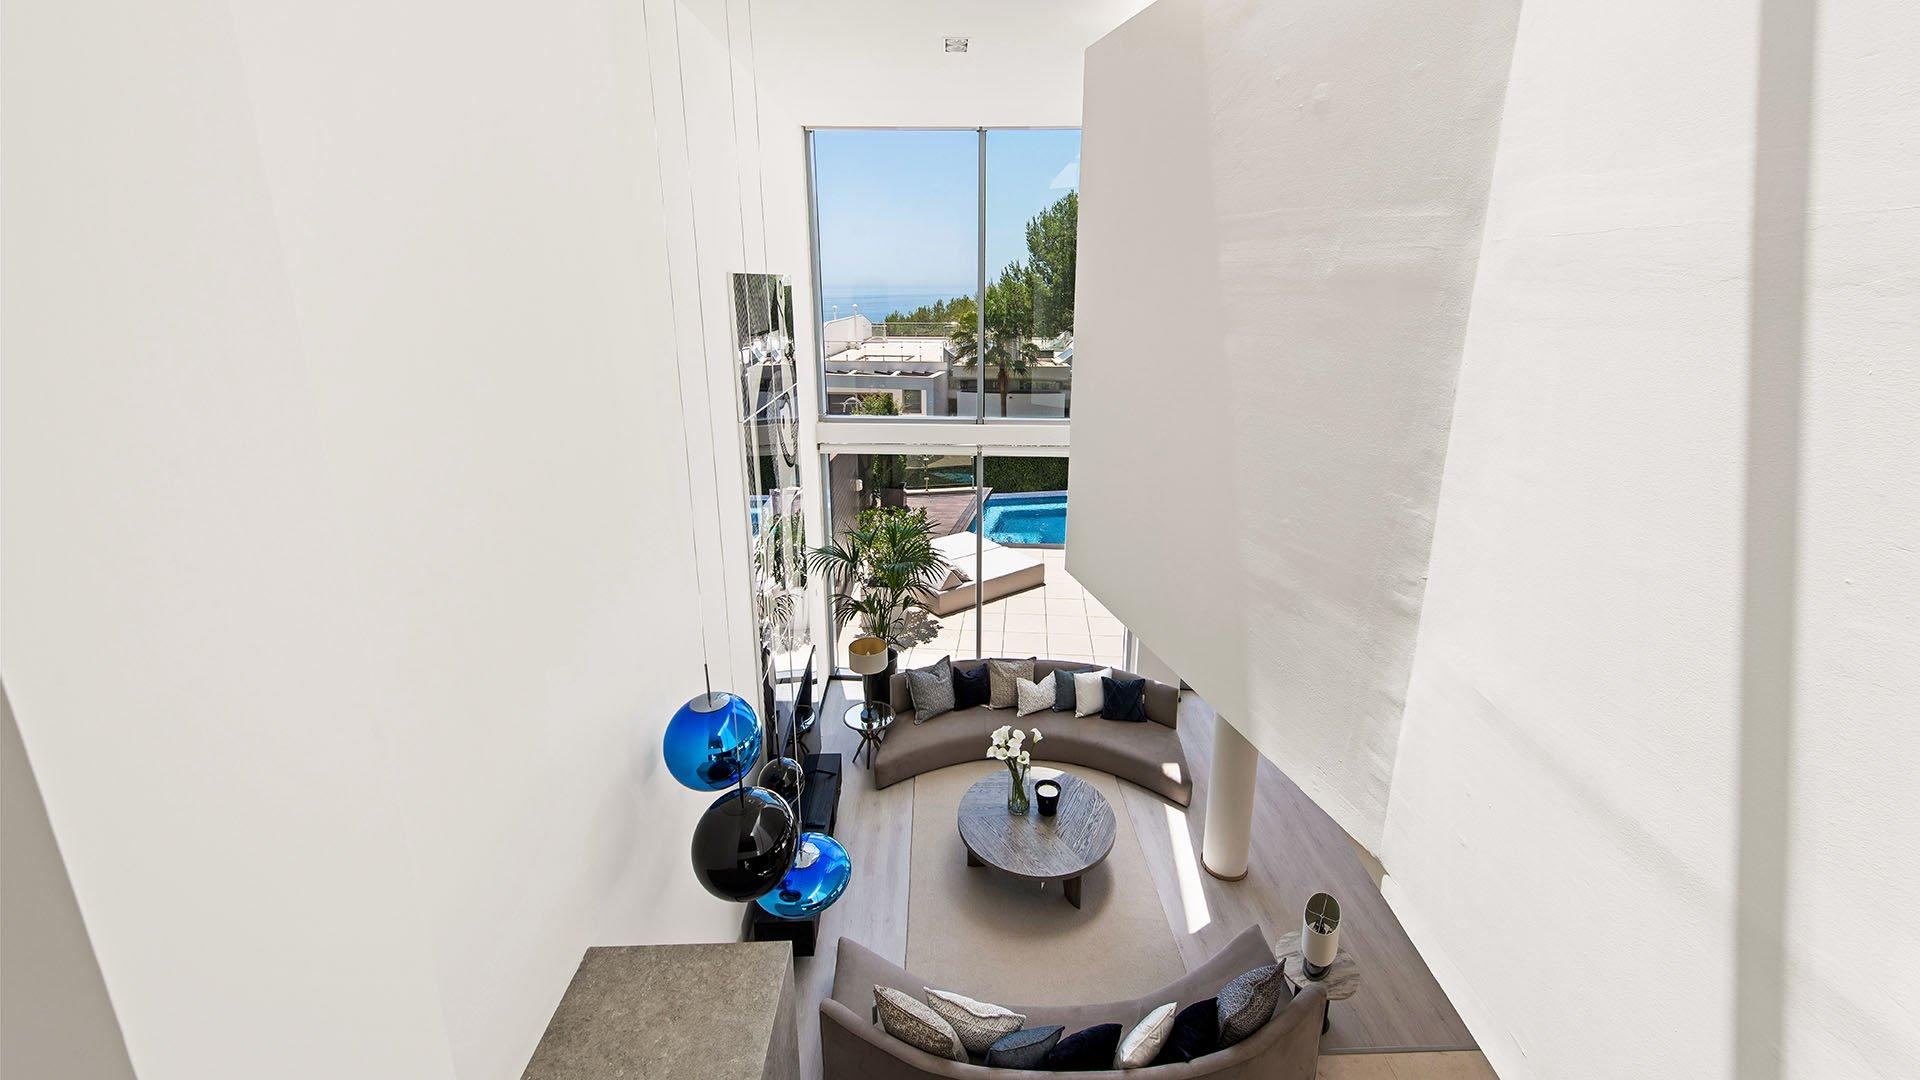 Altius 3: Woning in Marbella met adembenemend uitzicht